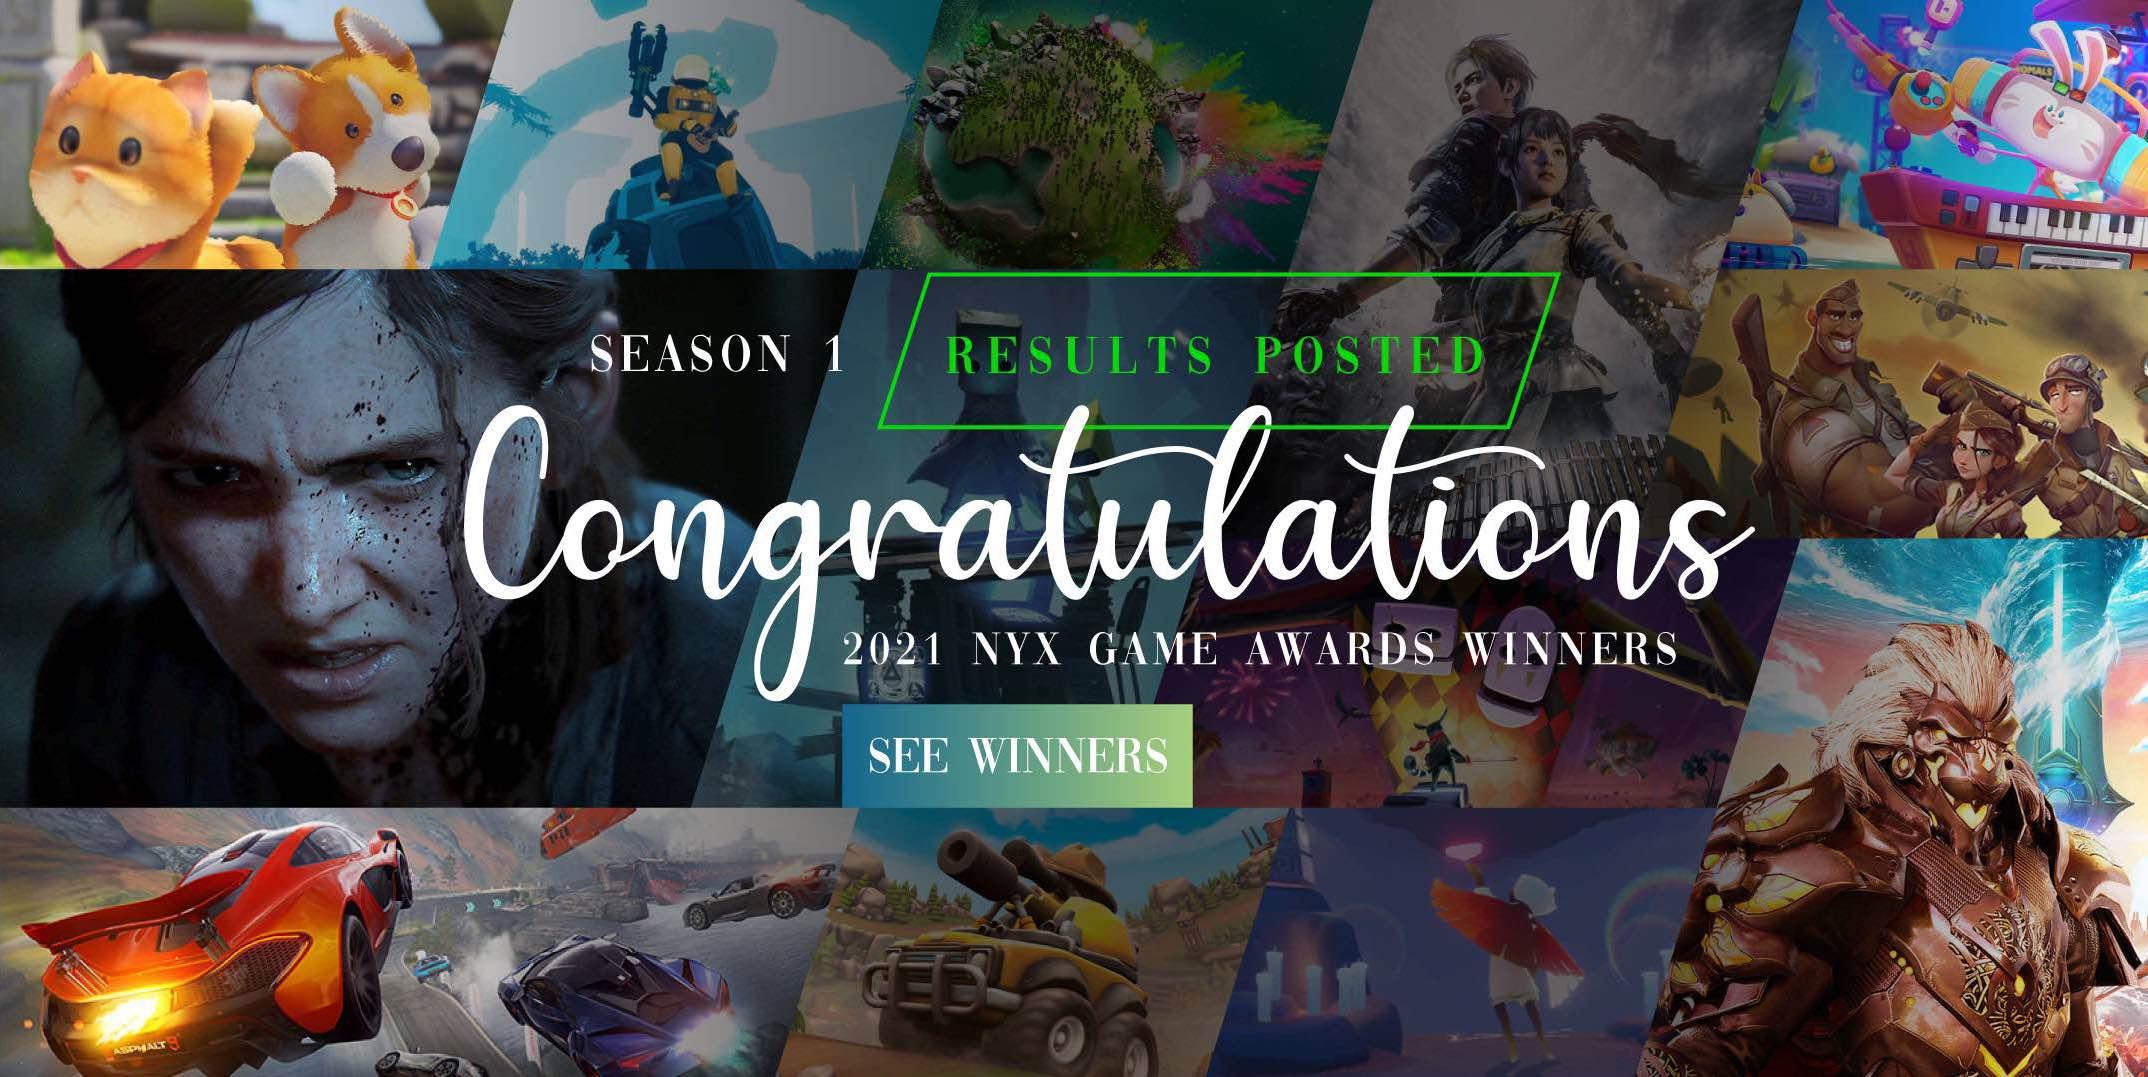 NYX Game Awards